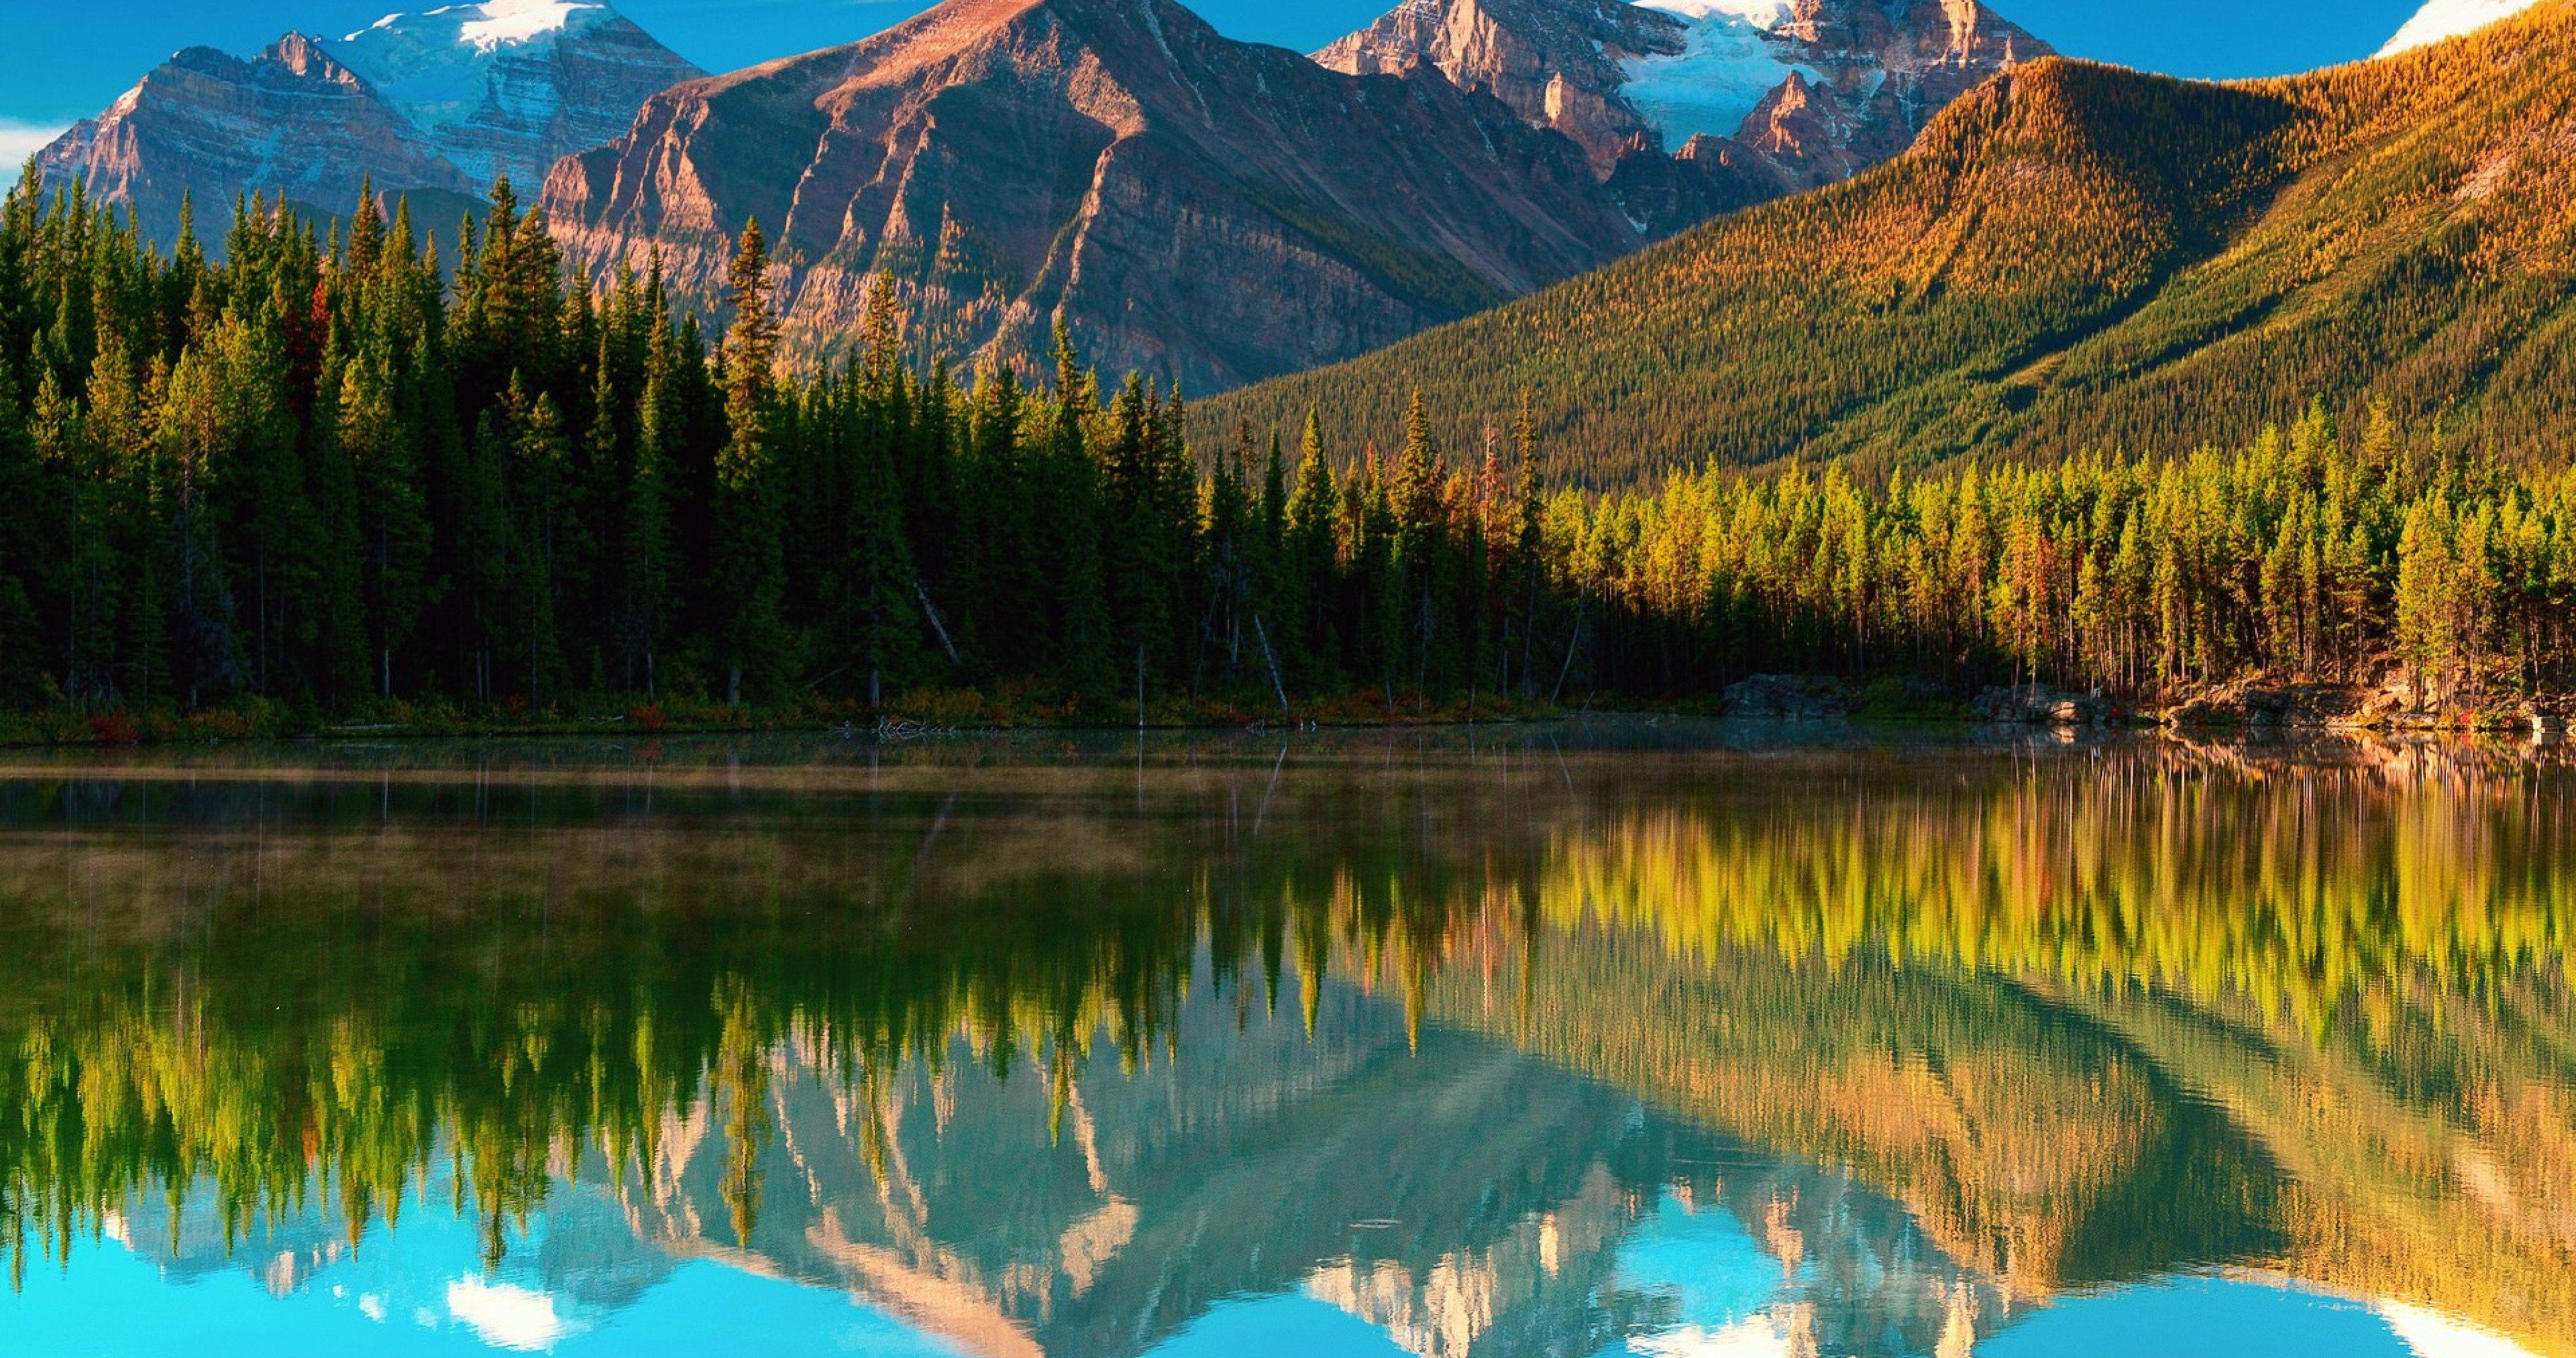 Canada Lake Herbert 4k Ultra Hd Wallpaper Canada Wallpaper Hd Canada Lakes Background Images